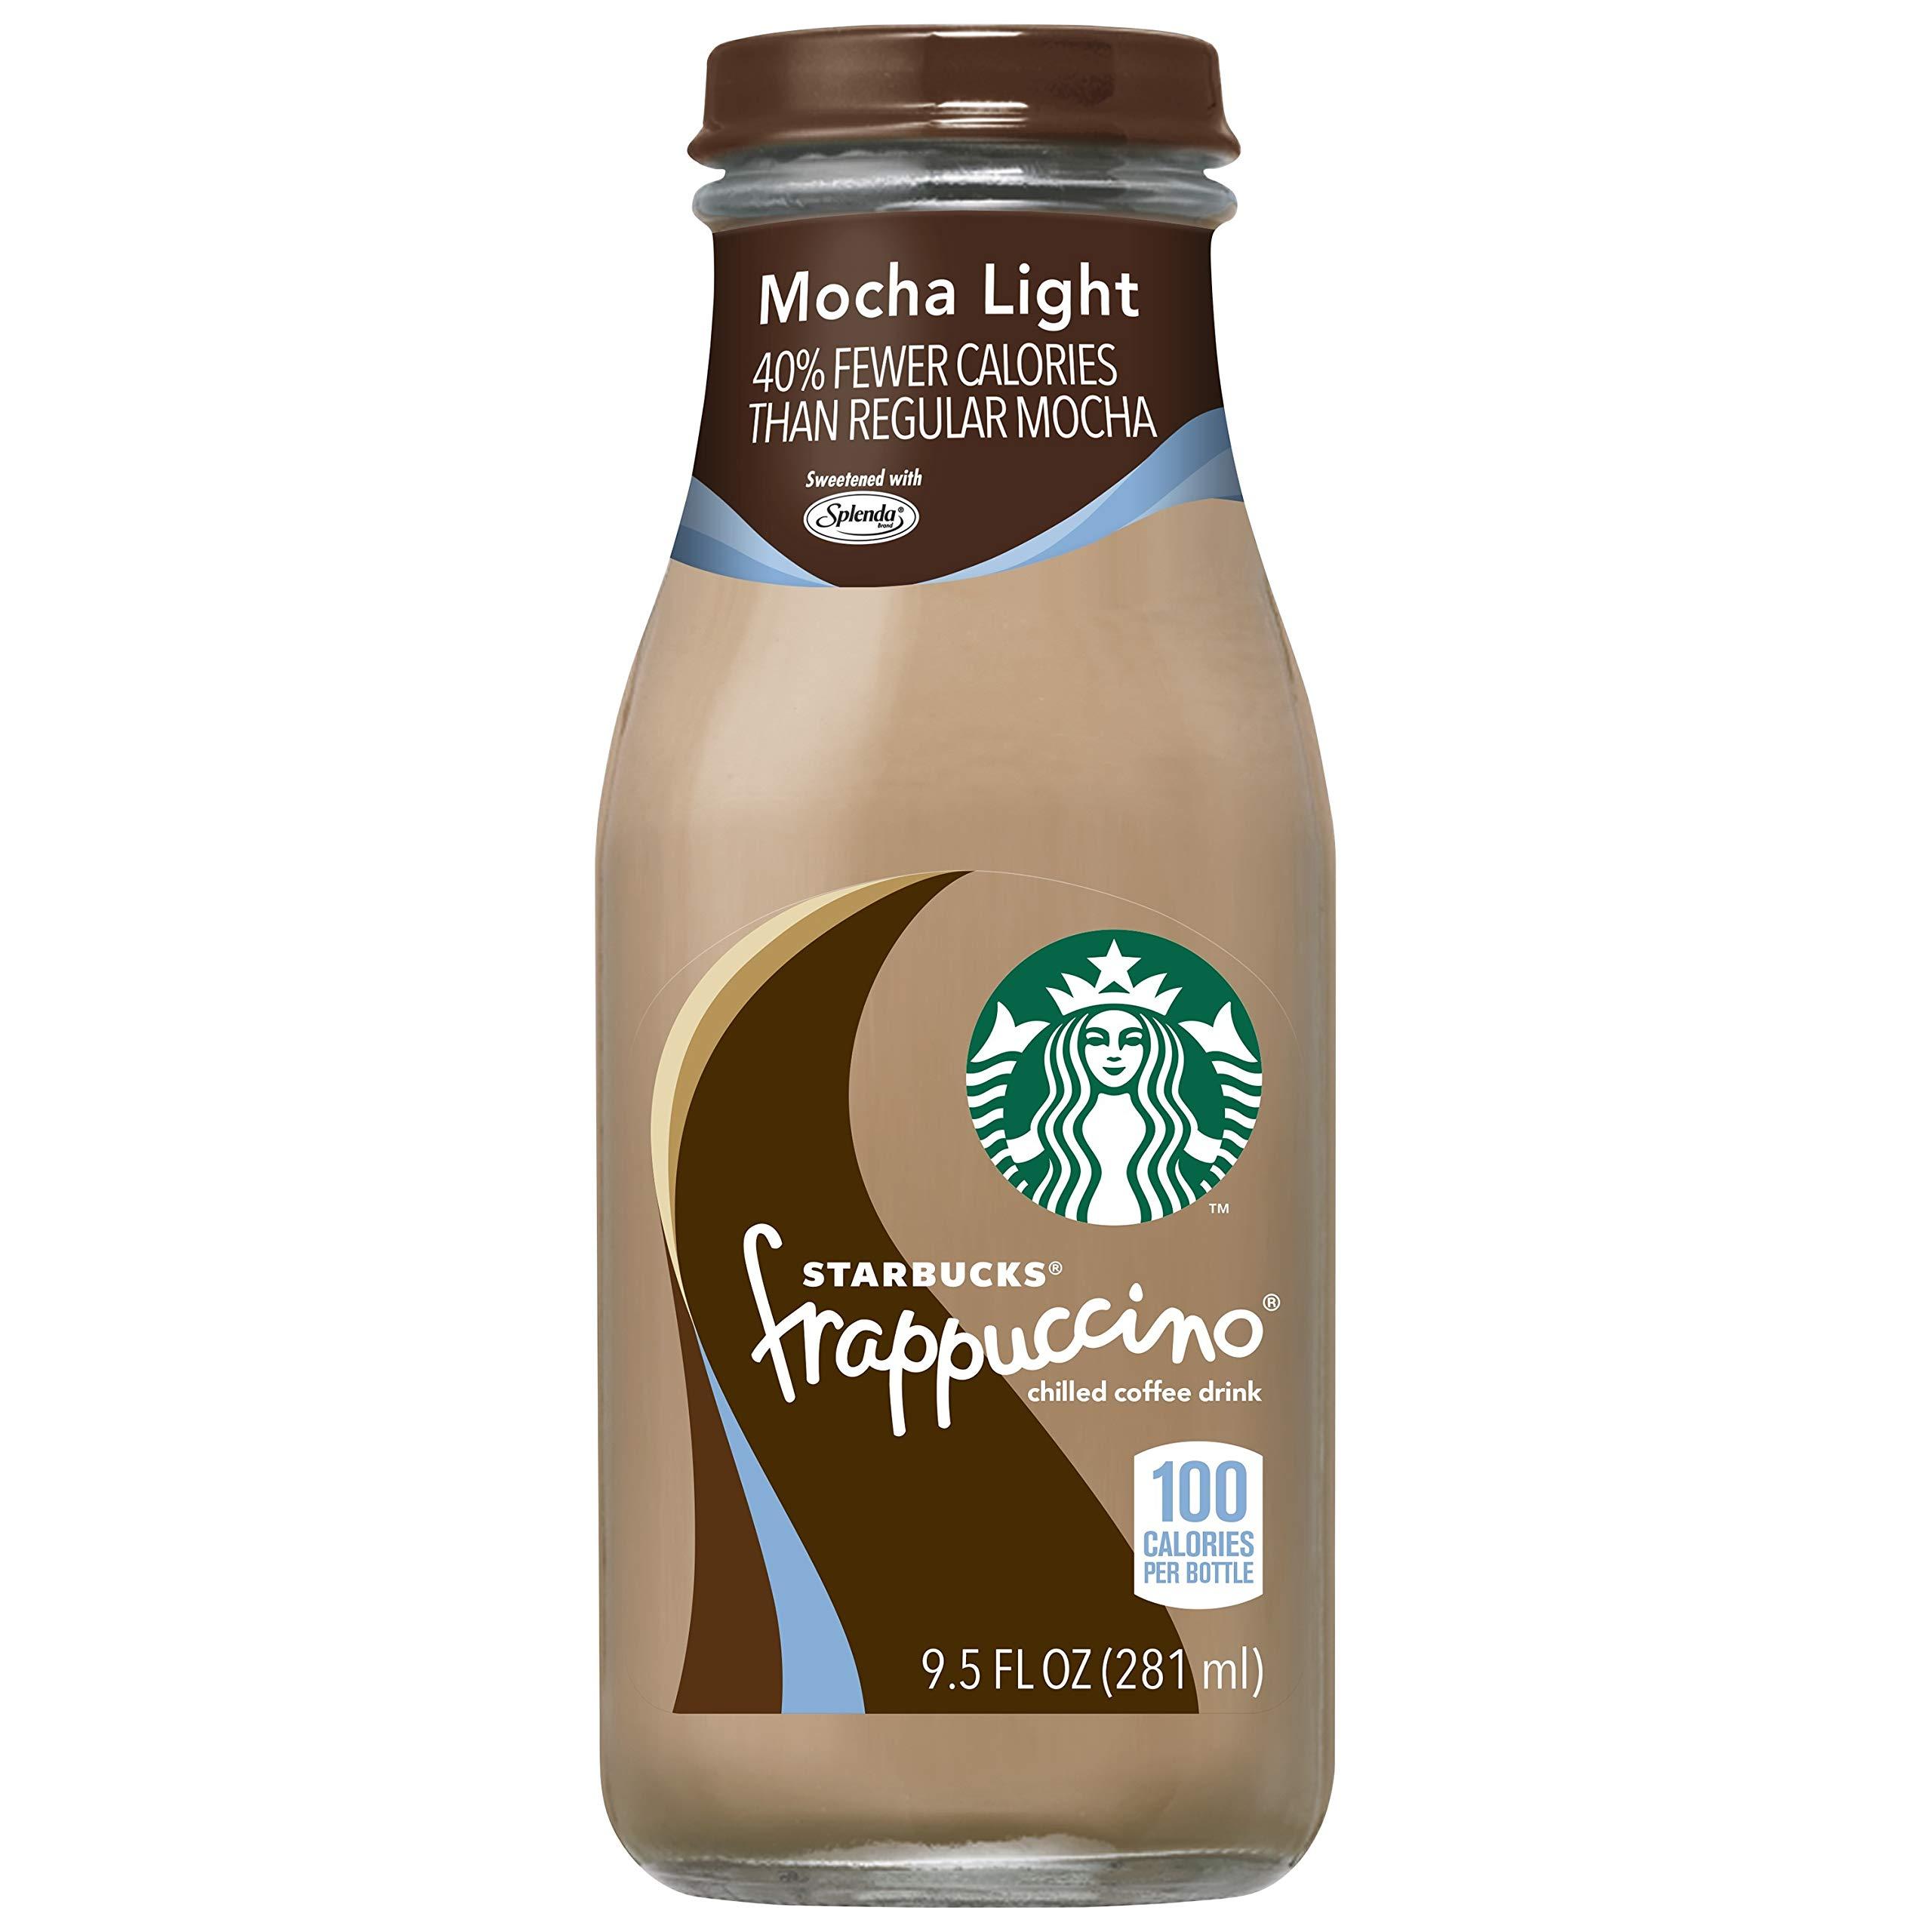 Starbucks Frappuccino, Mocha Light, 9.5 Fl Oz (15 Count) by Starbucks